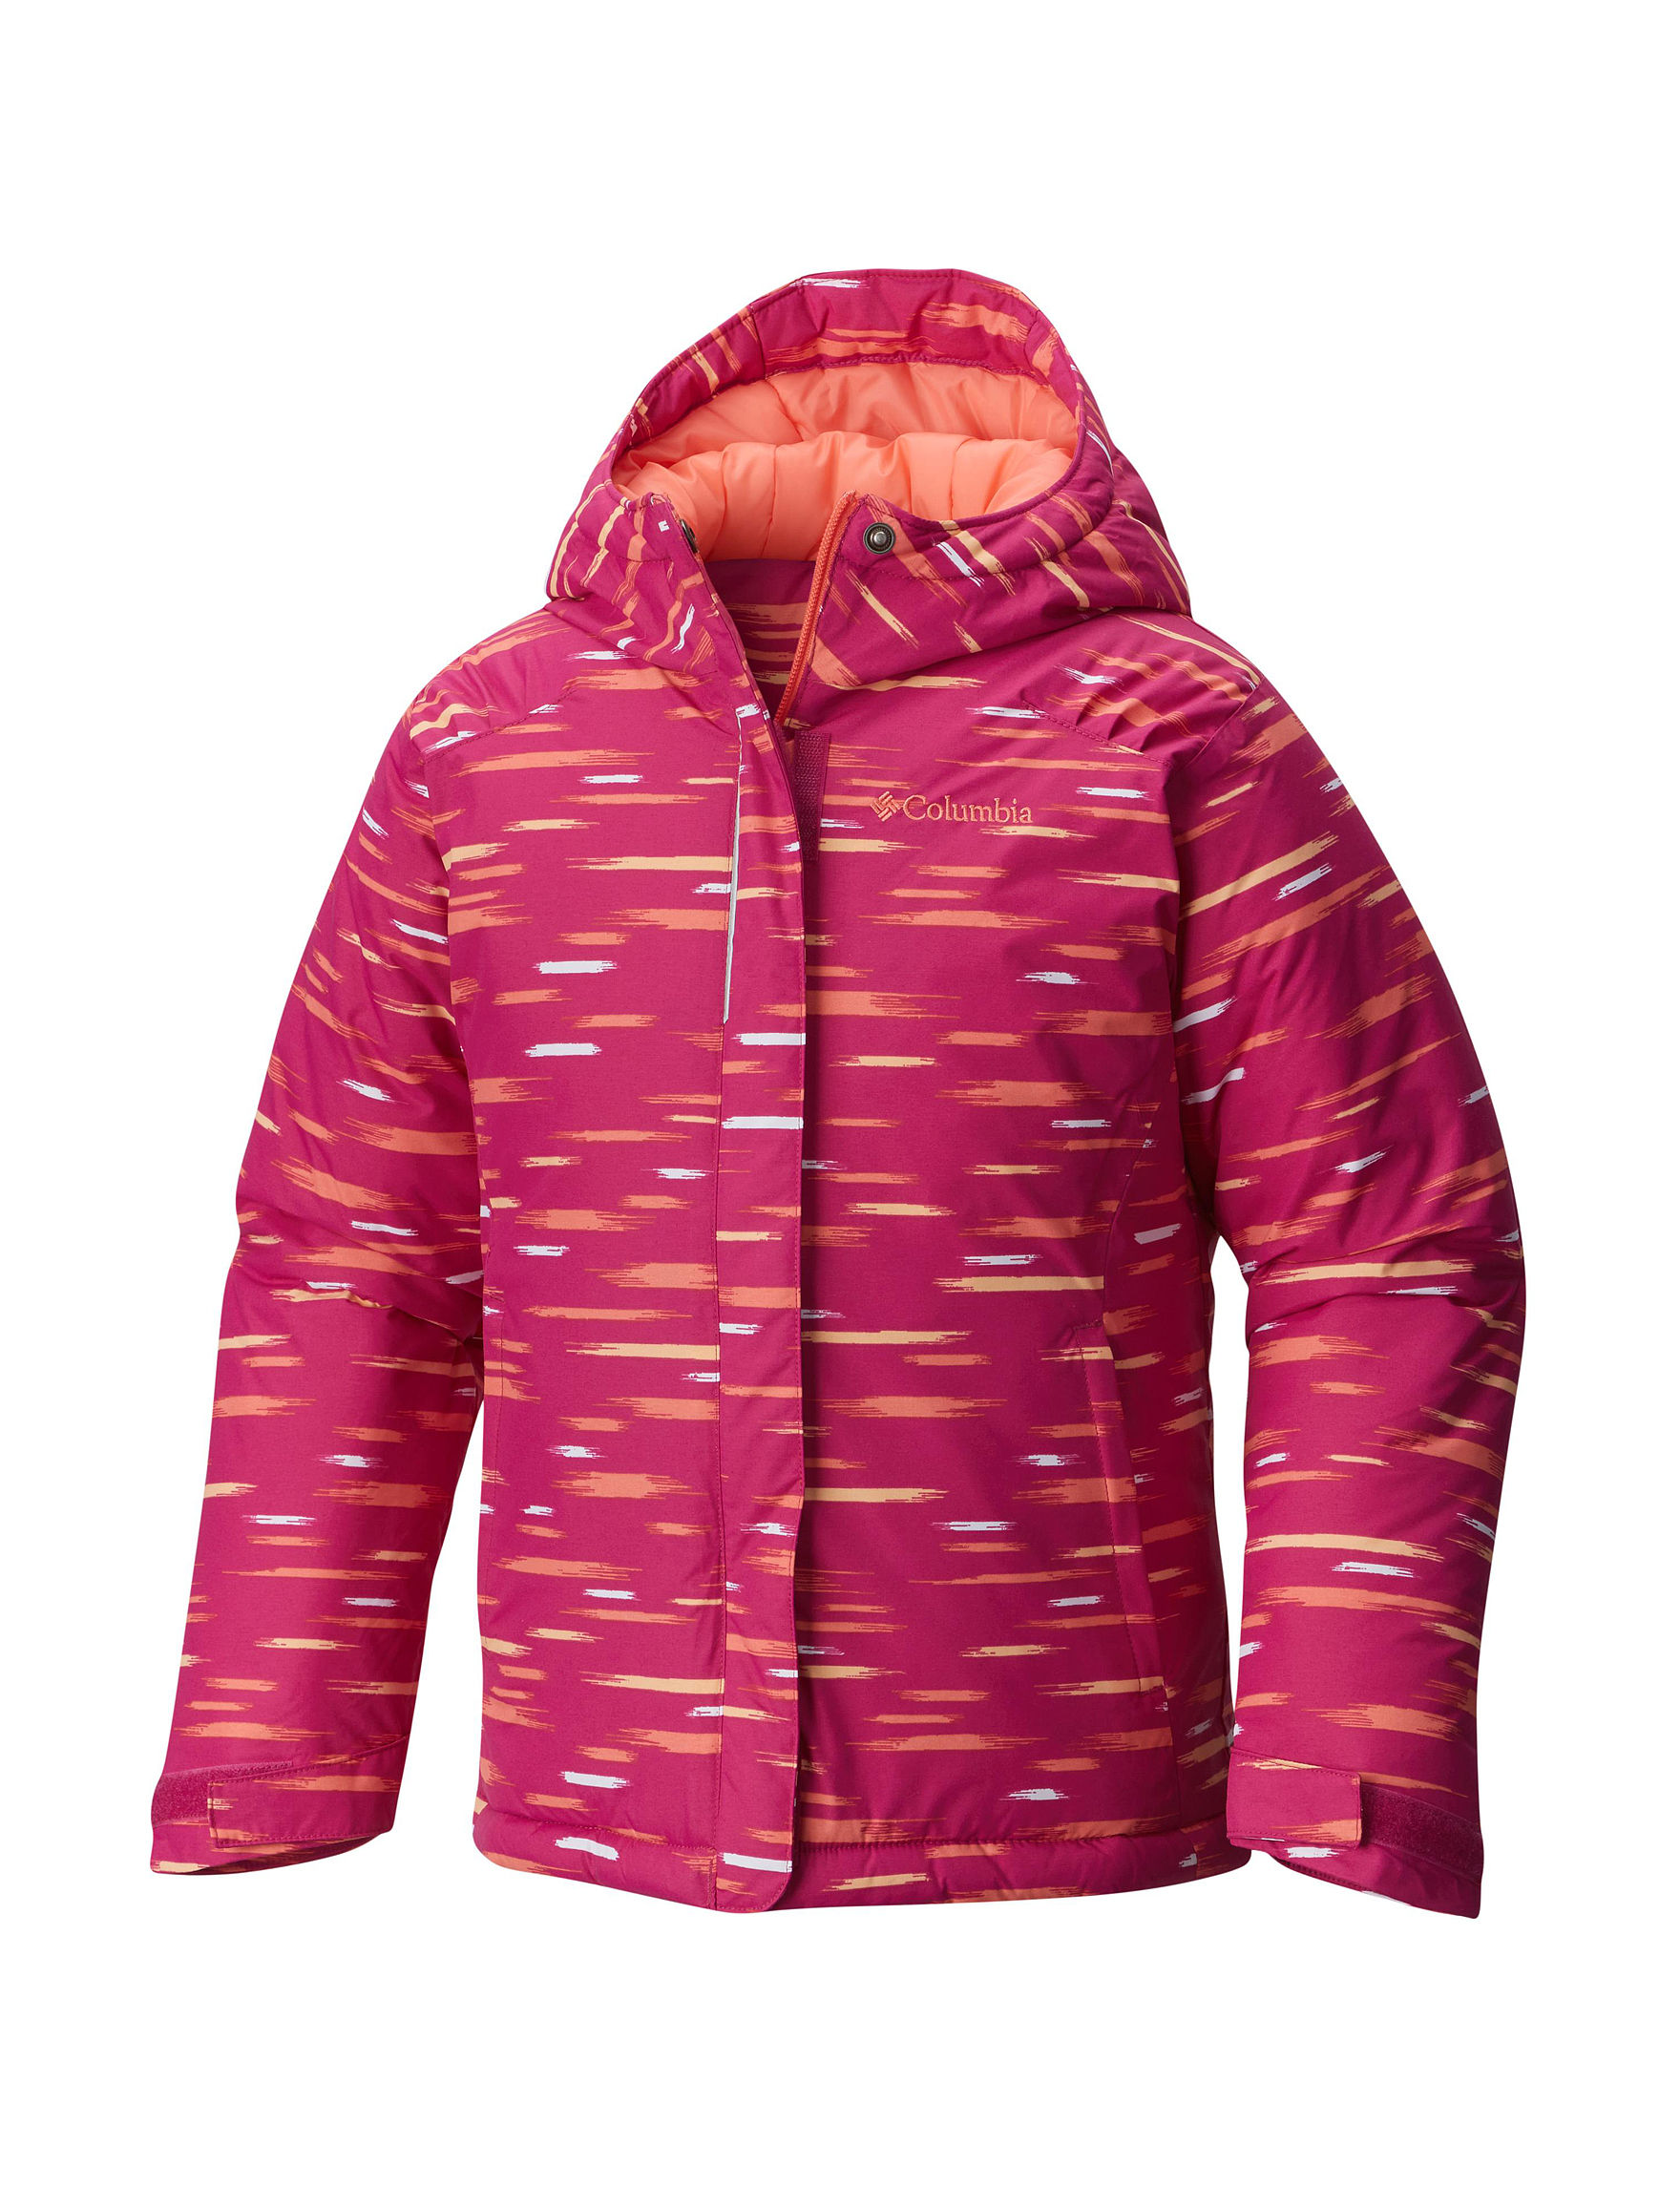 Columbia Pink Multi Fleece & Soft Shell Jackets